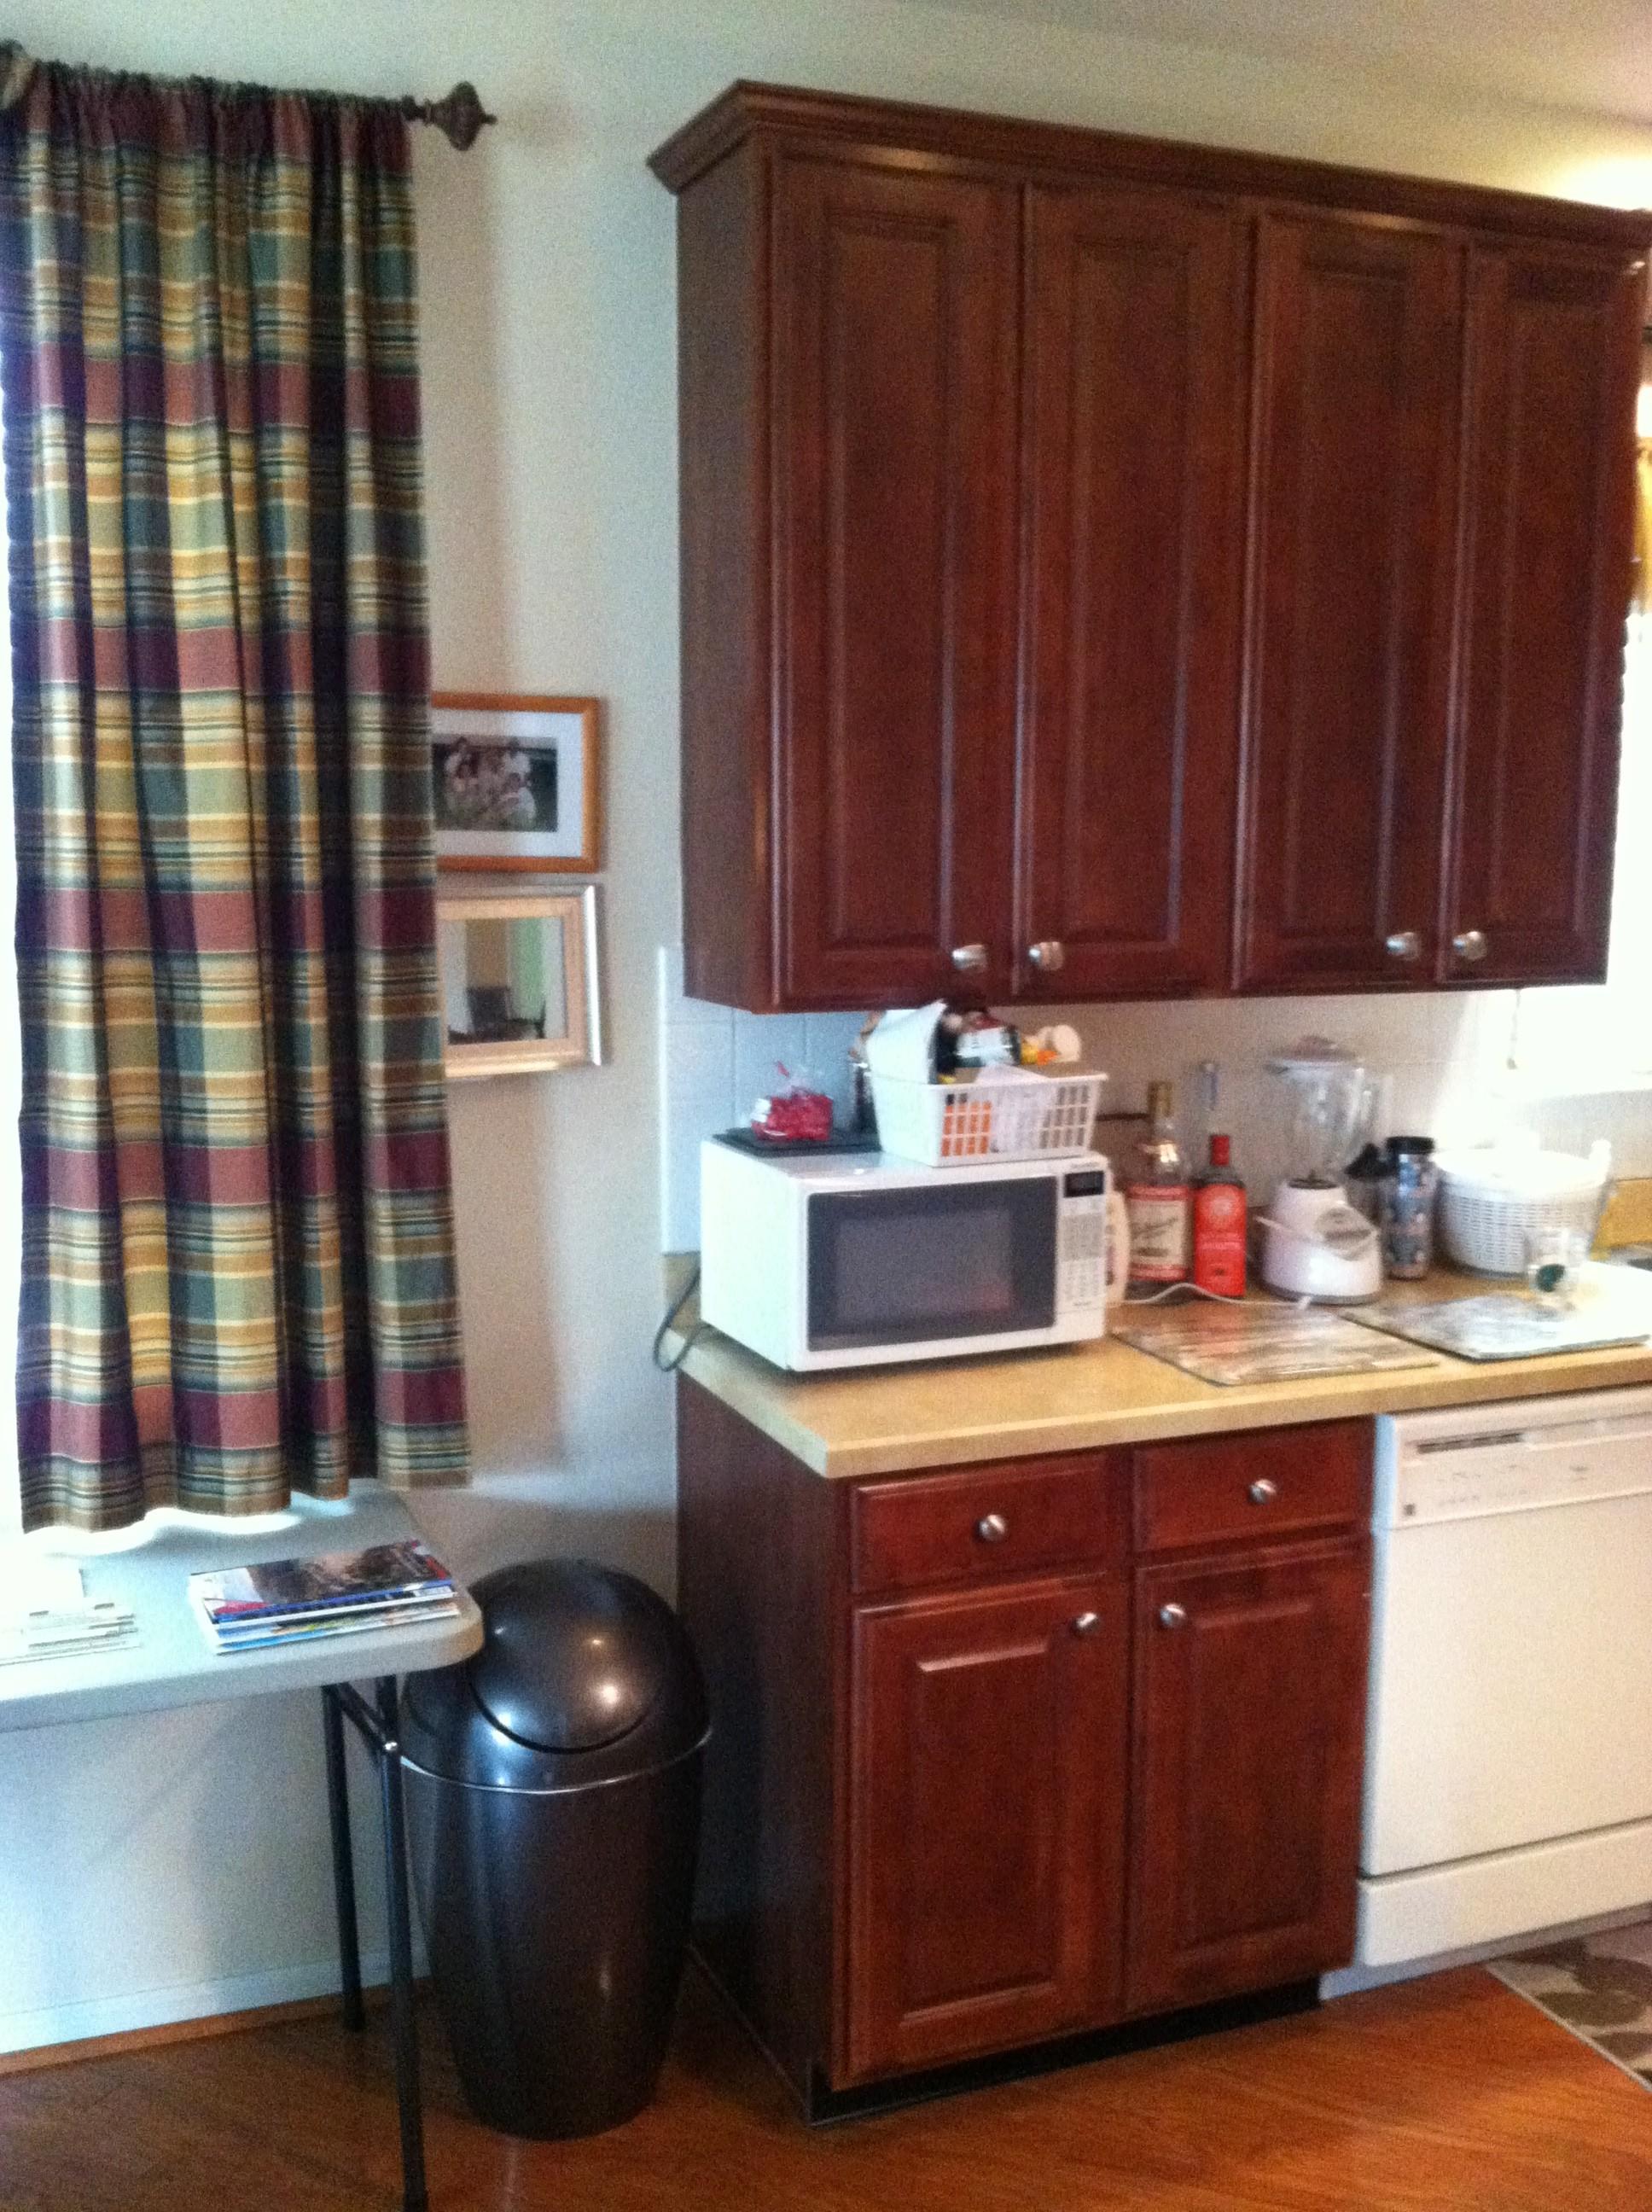 Kitchen remodel in West Deptford NJ – Add a little a lot